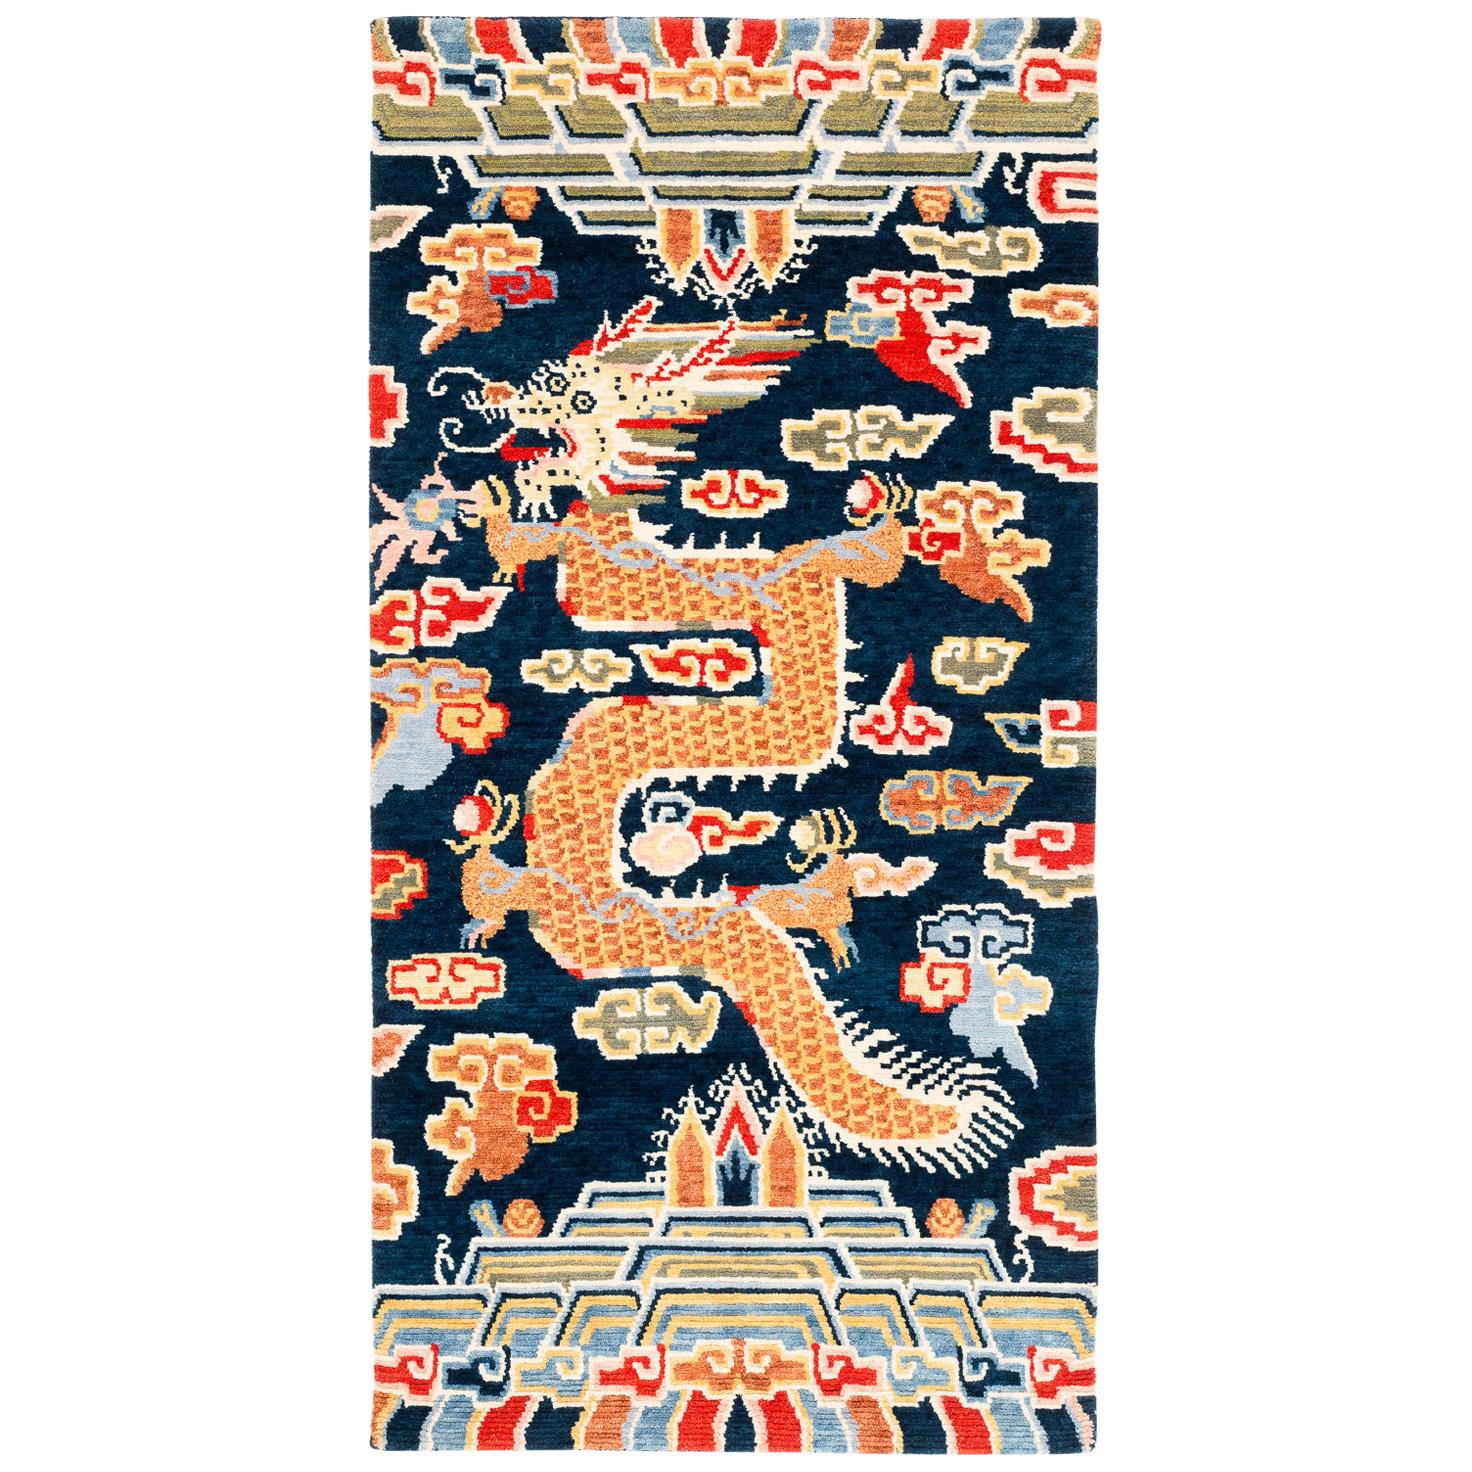 Indigo Blue, Red, Green, Orange Wool Tibetan Dragon Area Rug